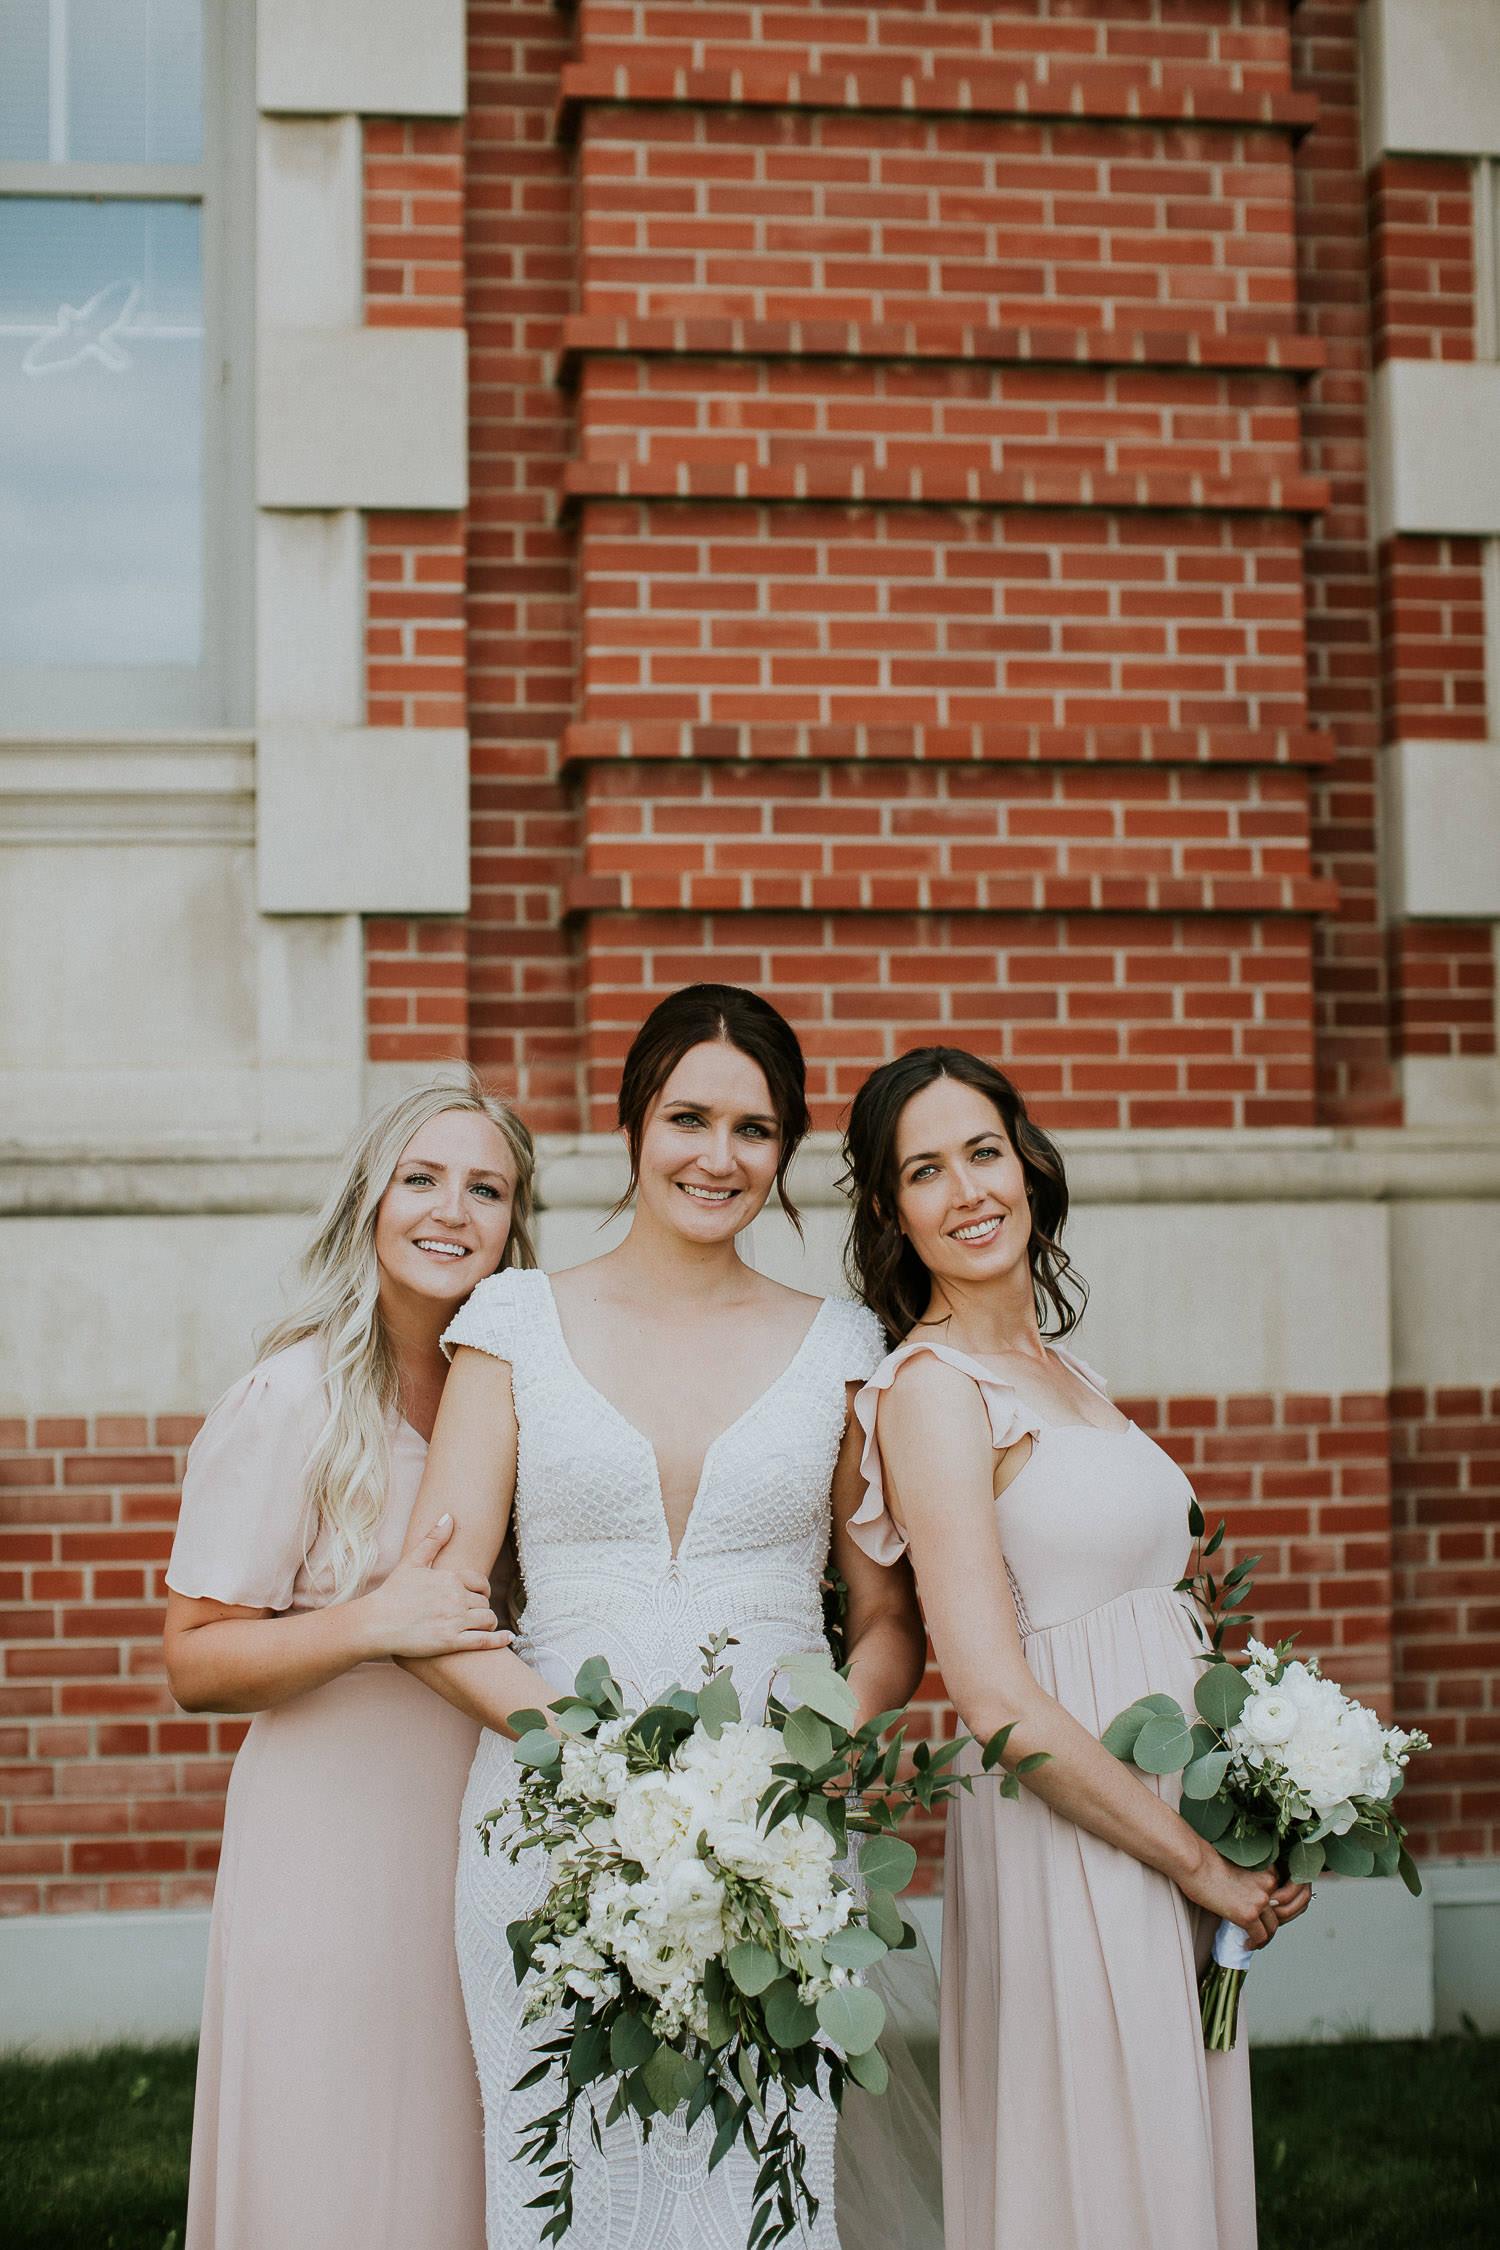 summer-backyard-wedding-in-alberta-sarah-pukin-0067